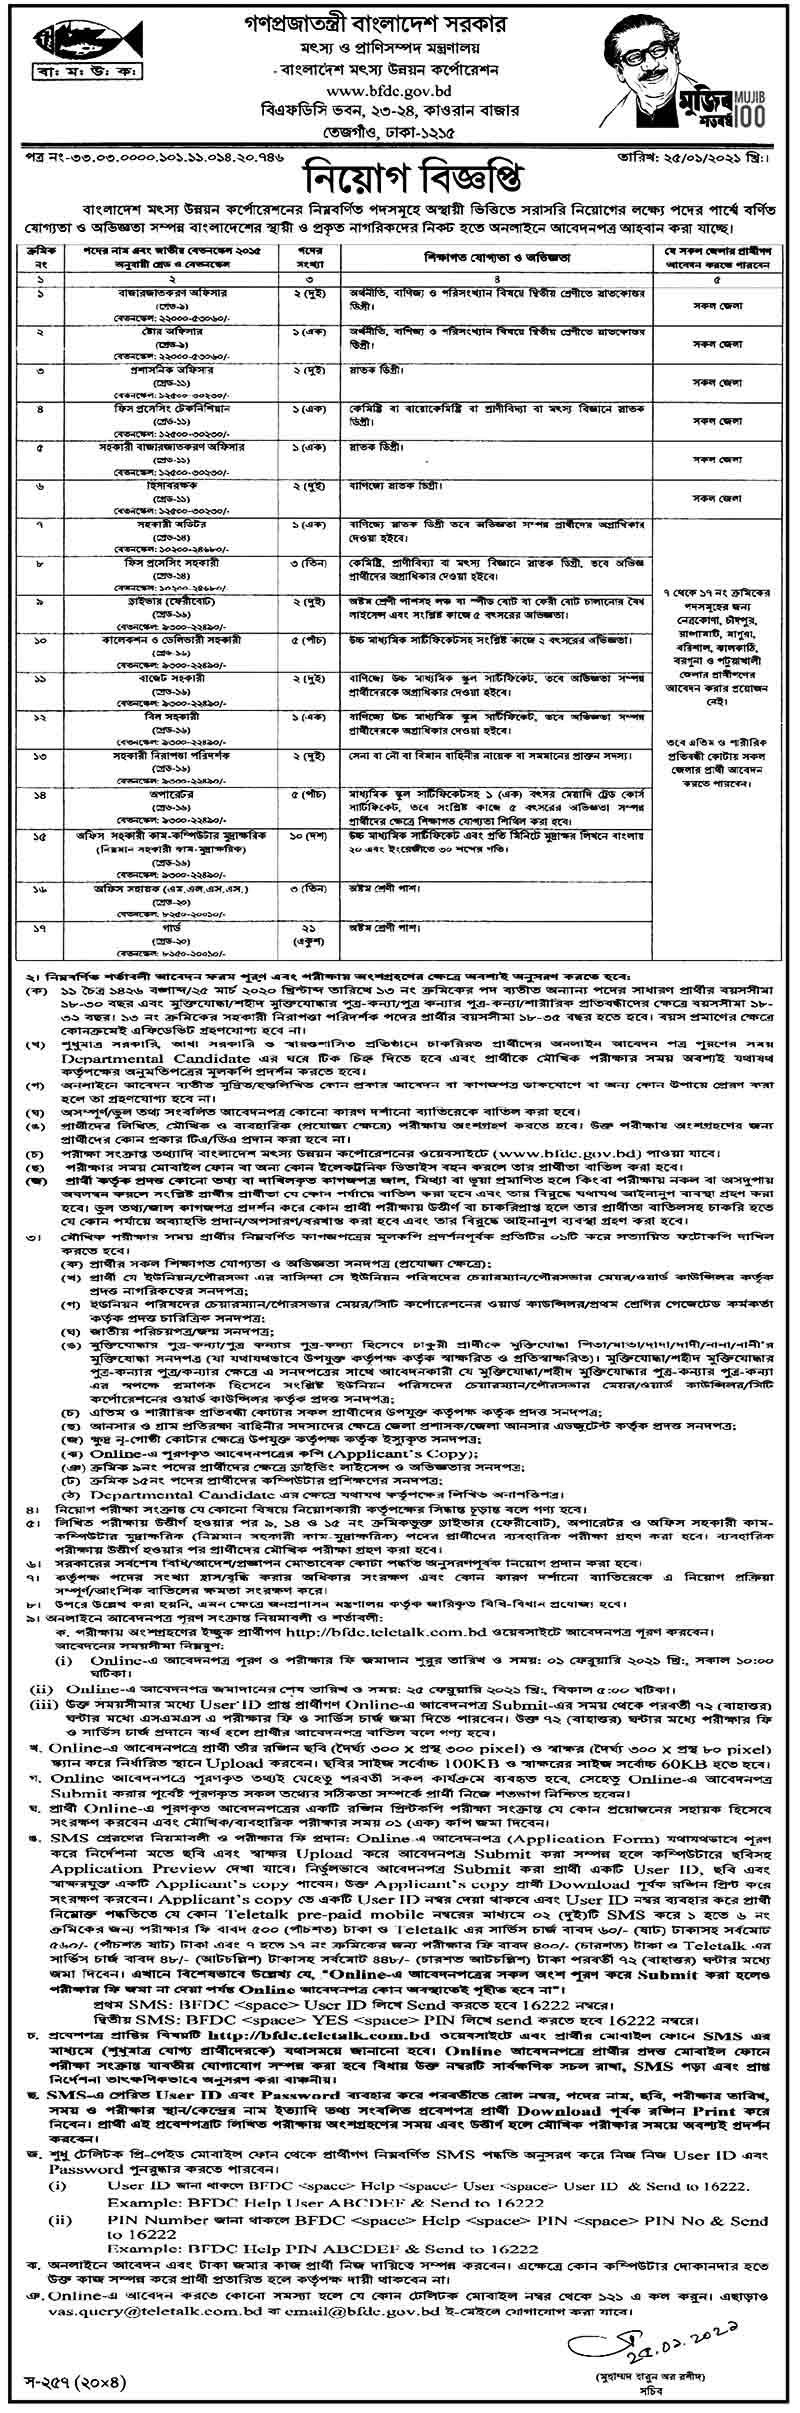 Bangladesh Fisheries Development Corporation Job Circular 2021